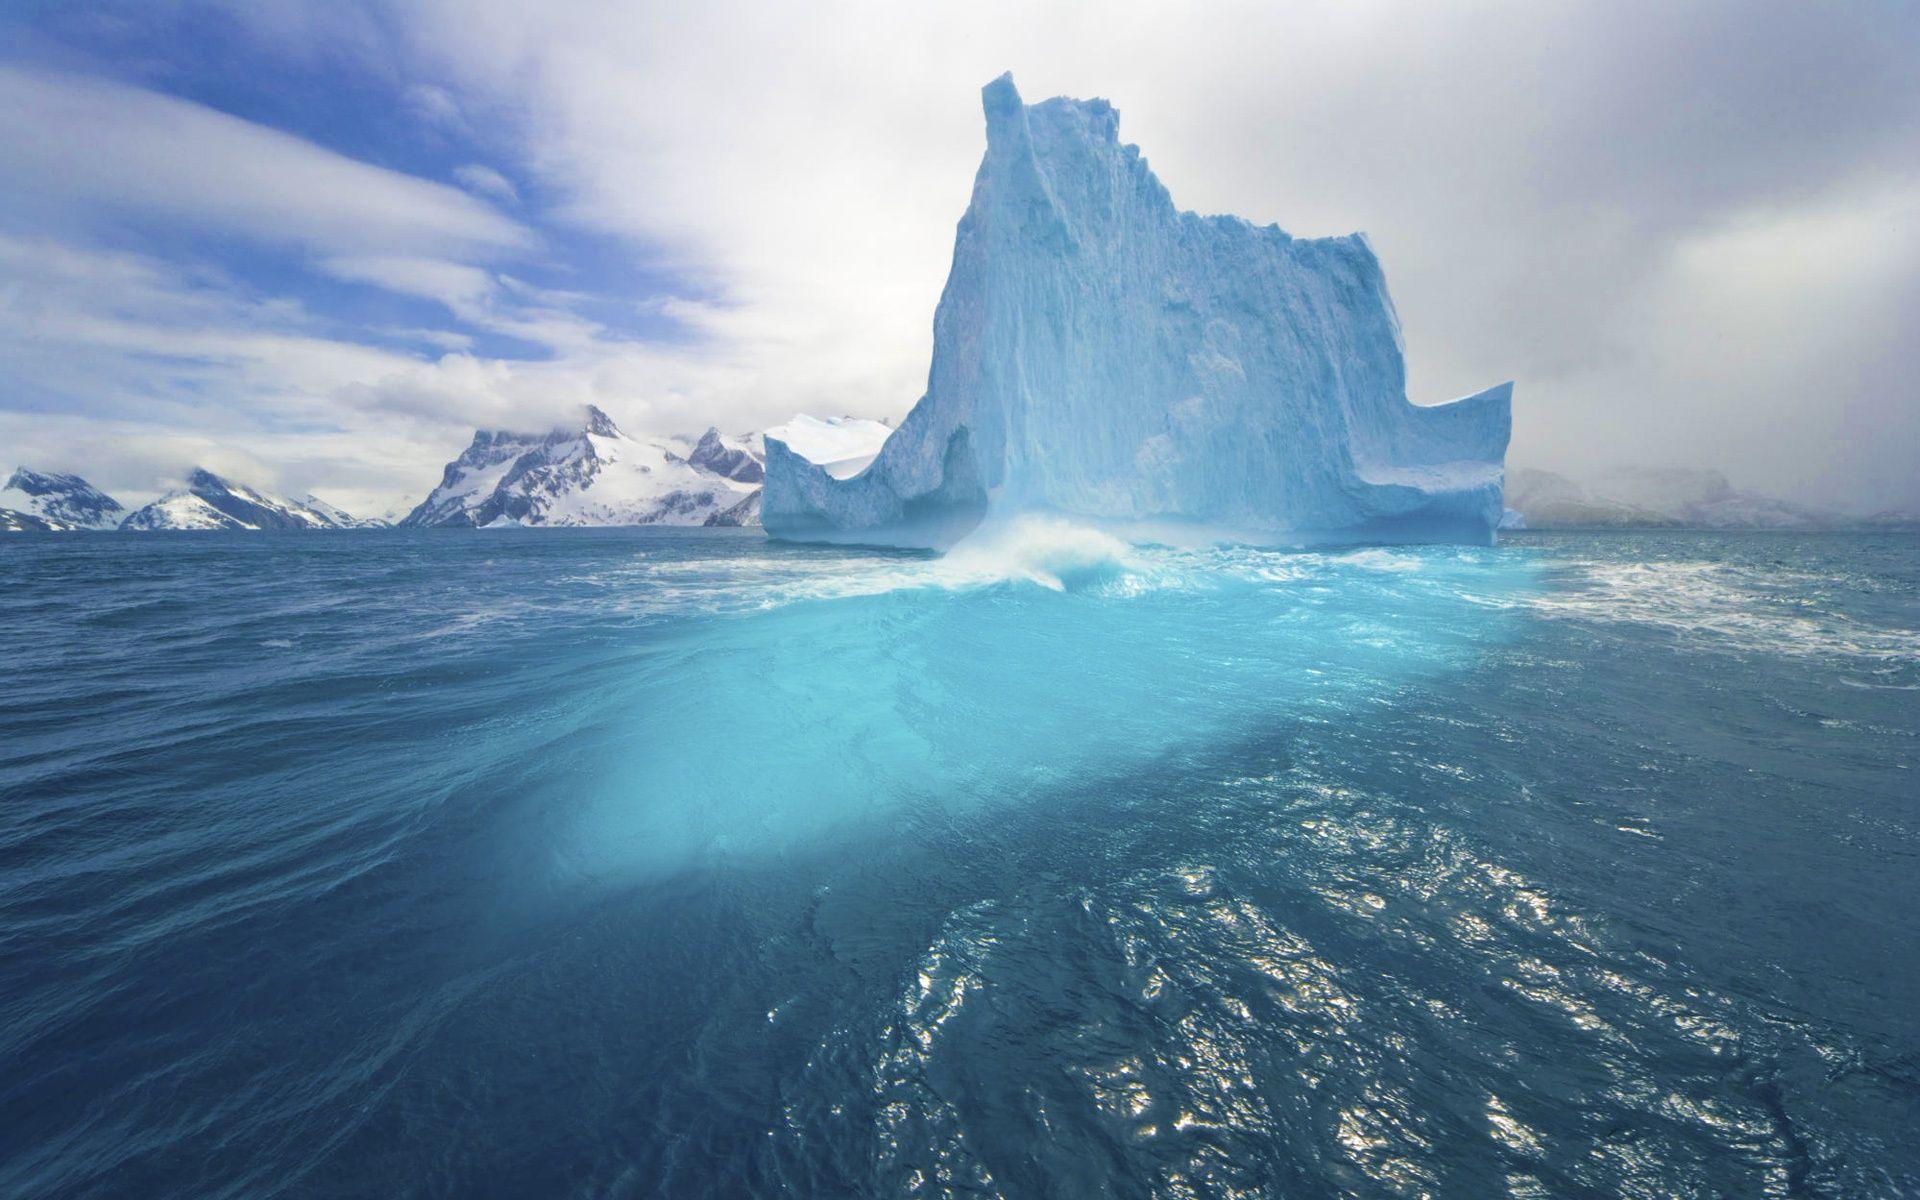 Big Arctic Iceberg (click to view)